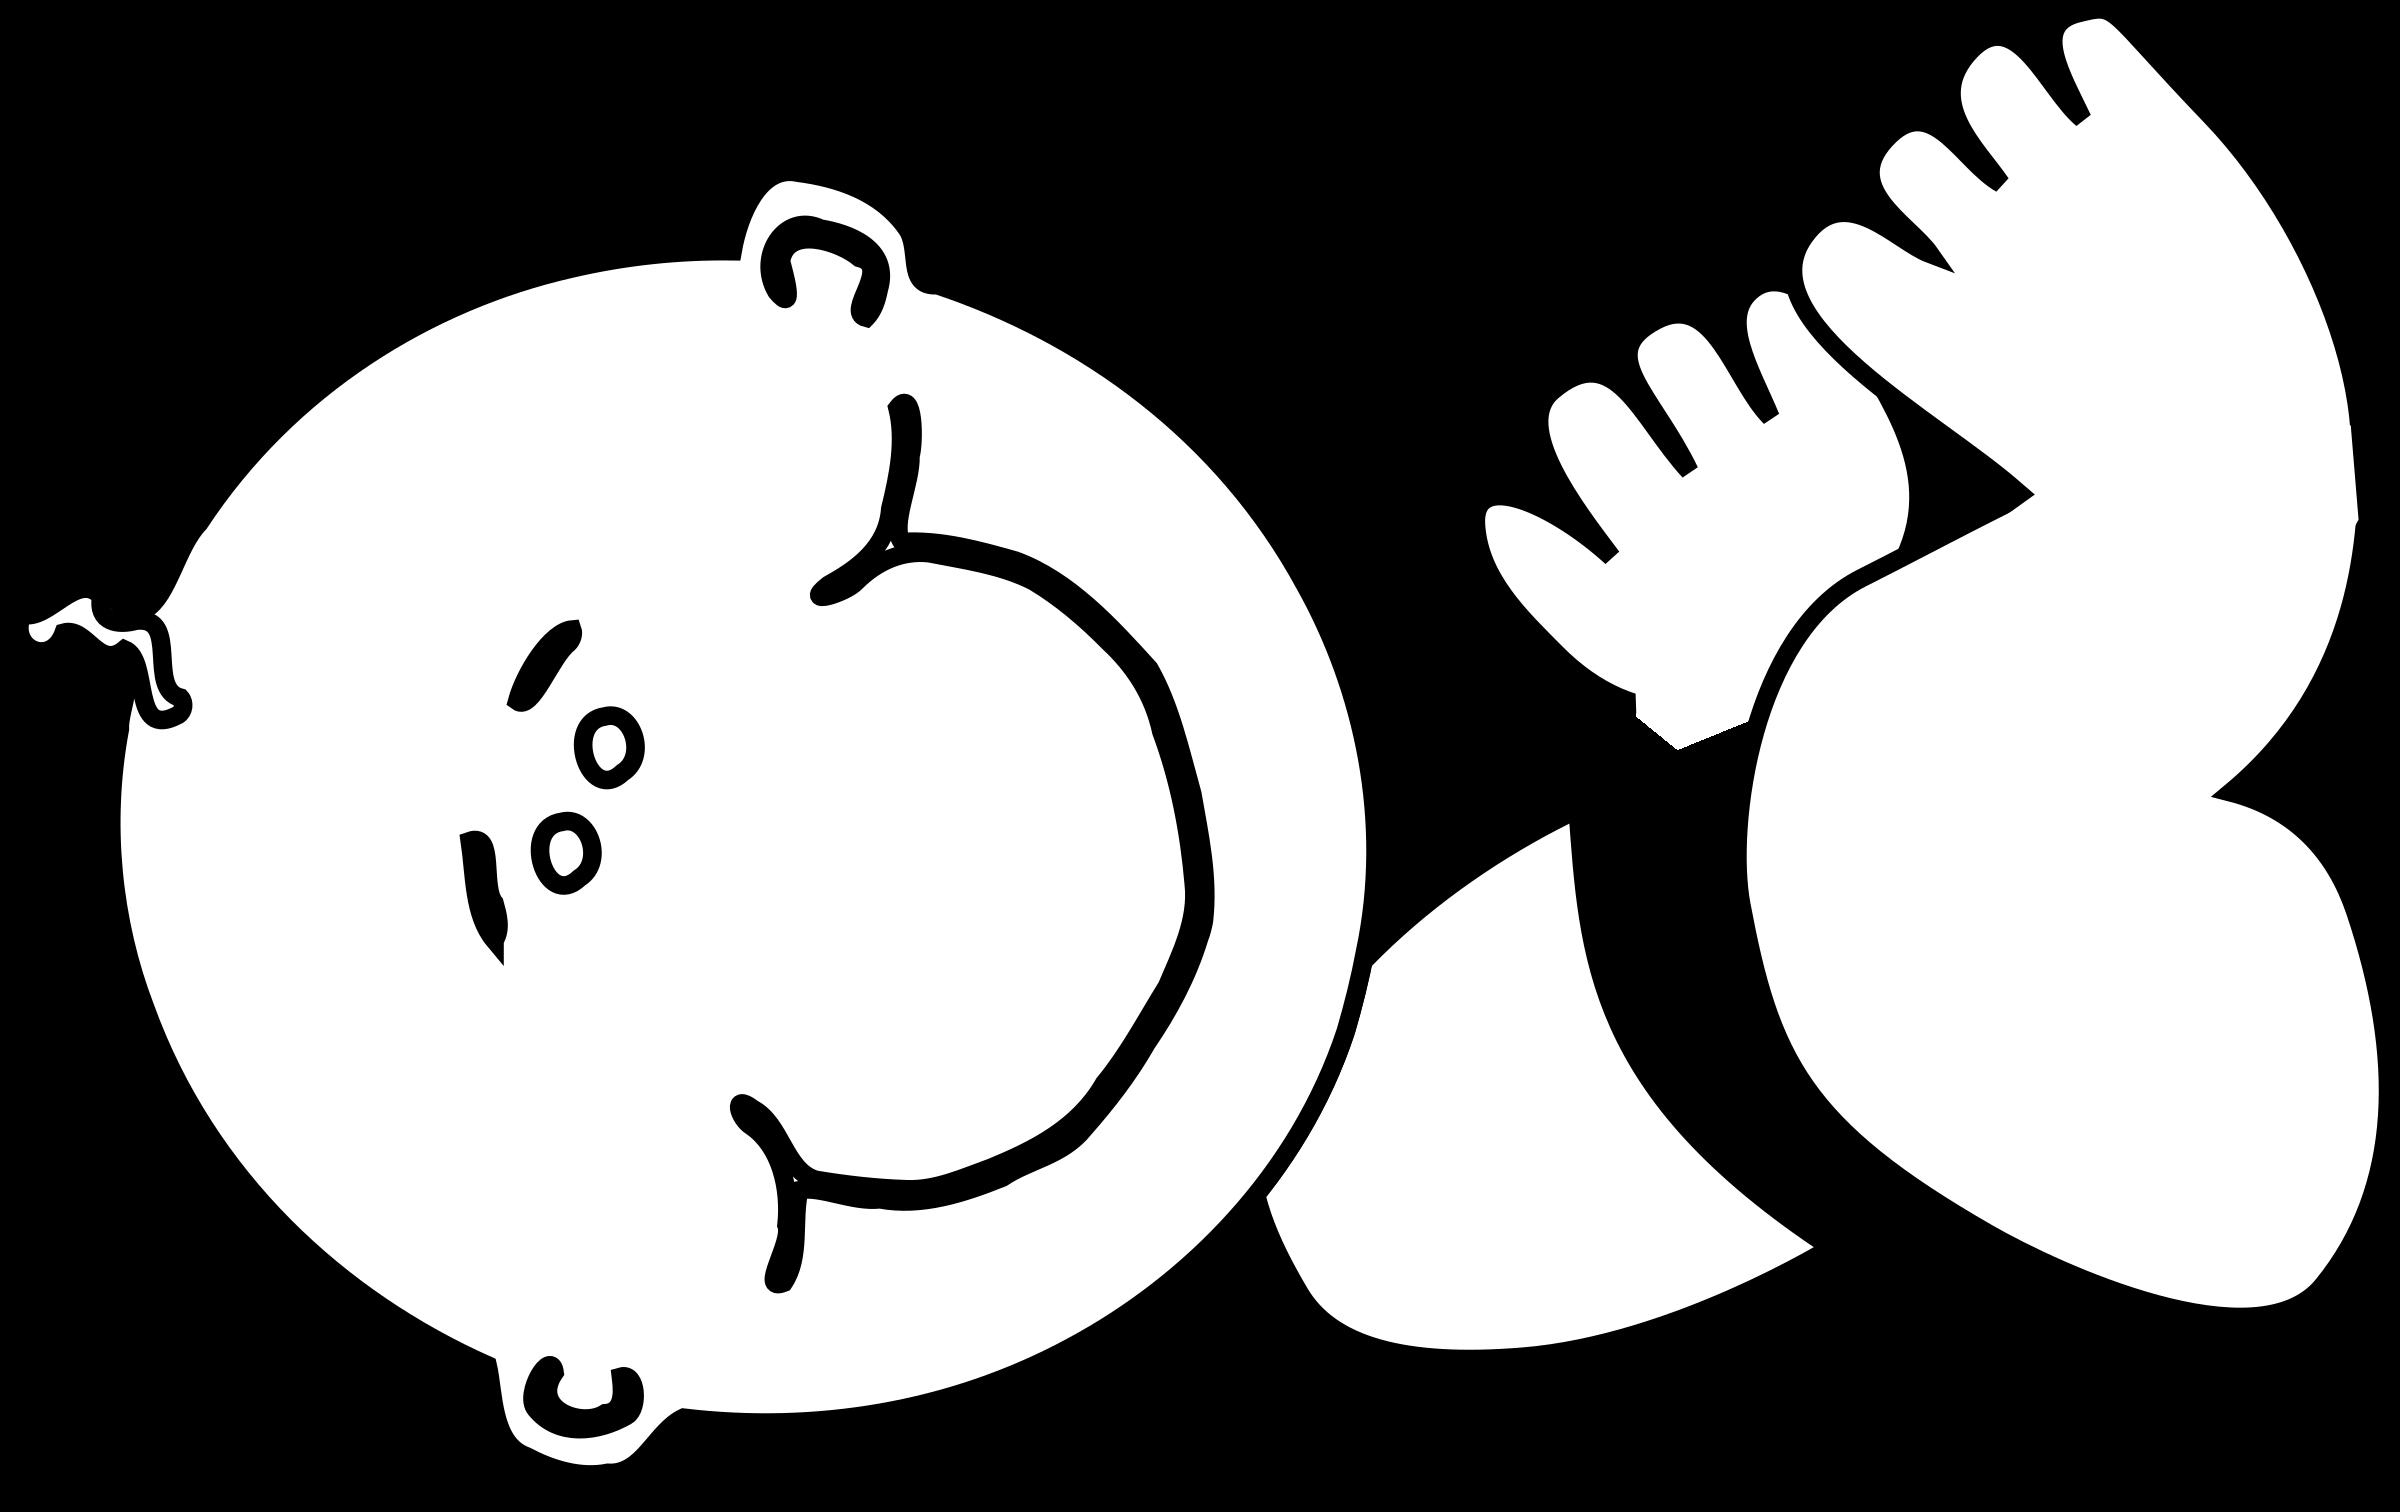 Line Art Baby : Big image png